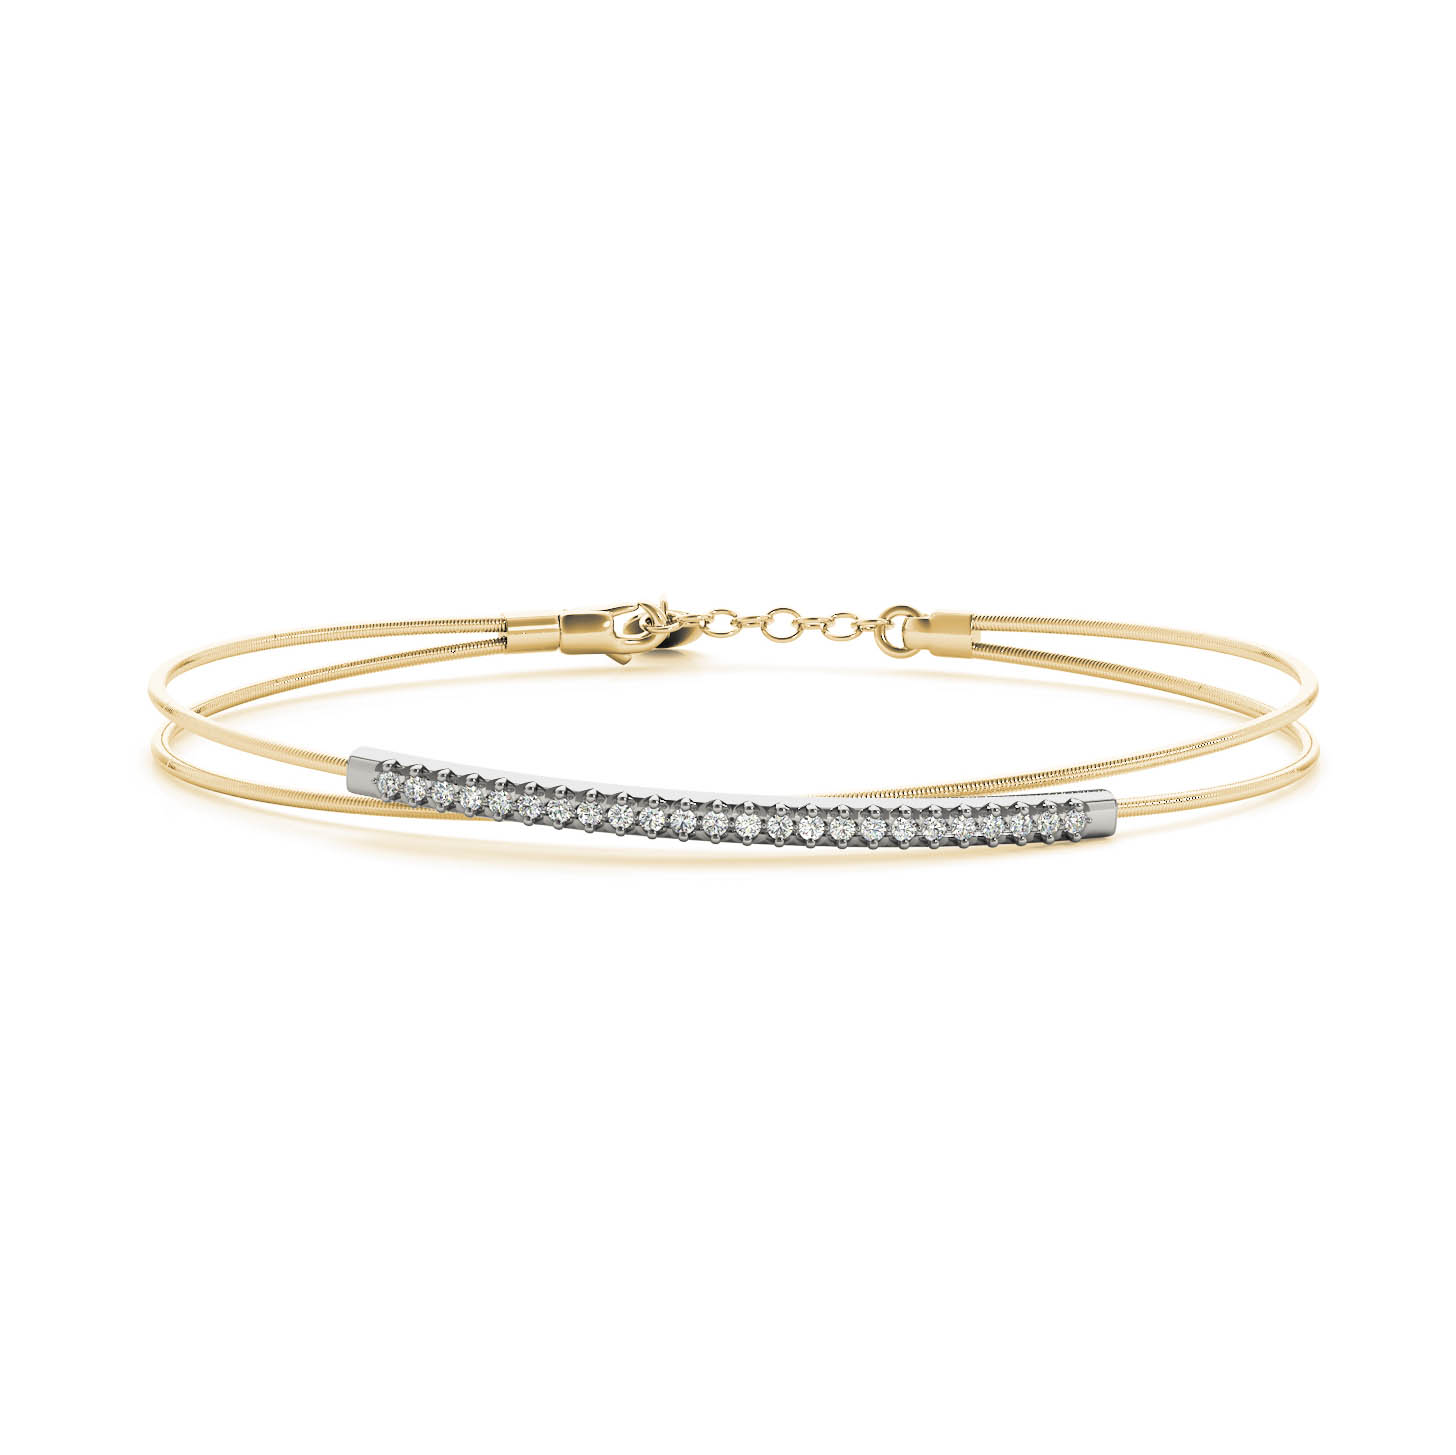 Gold Italy Platinum: Italian Flexible Diamond Bangle Bracelet 0.14 Carats Gold